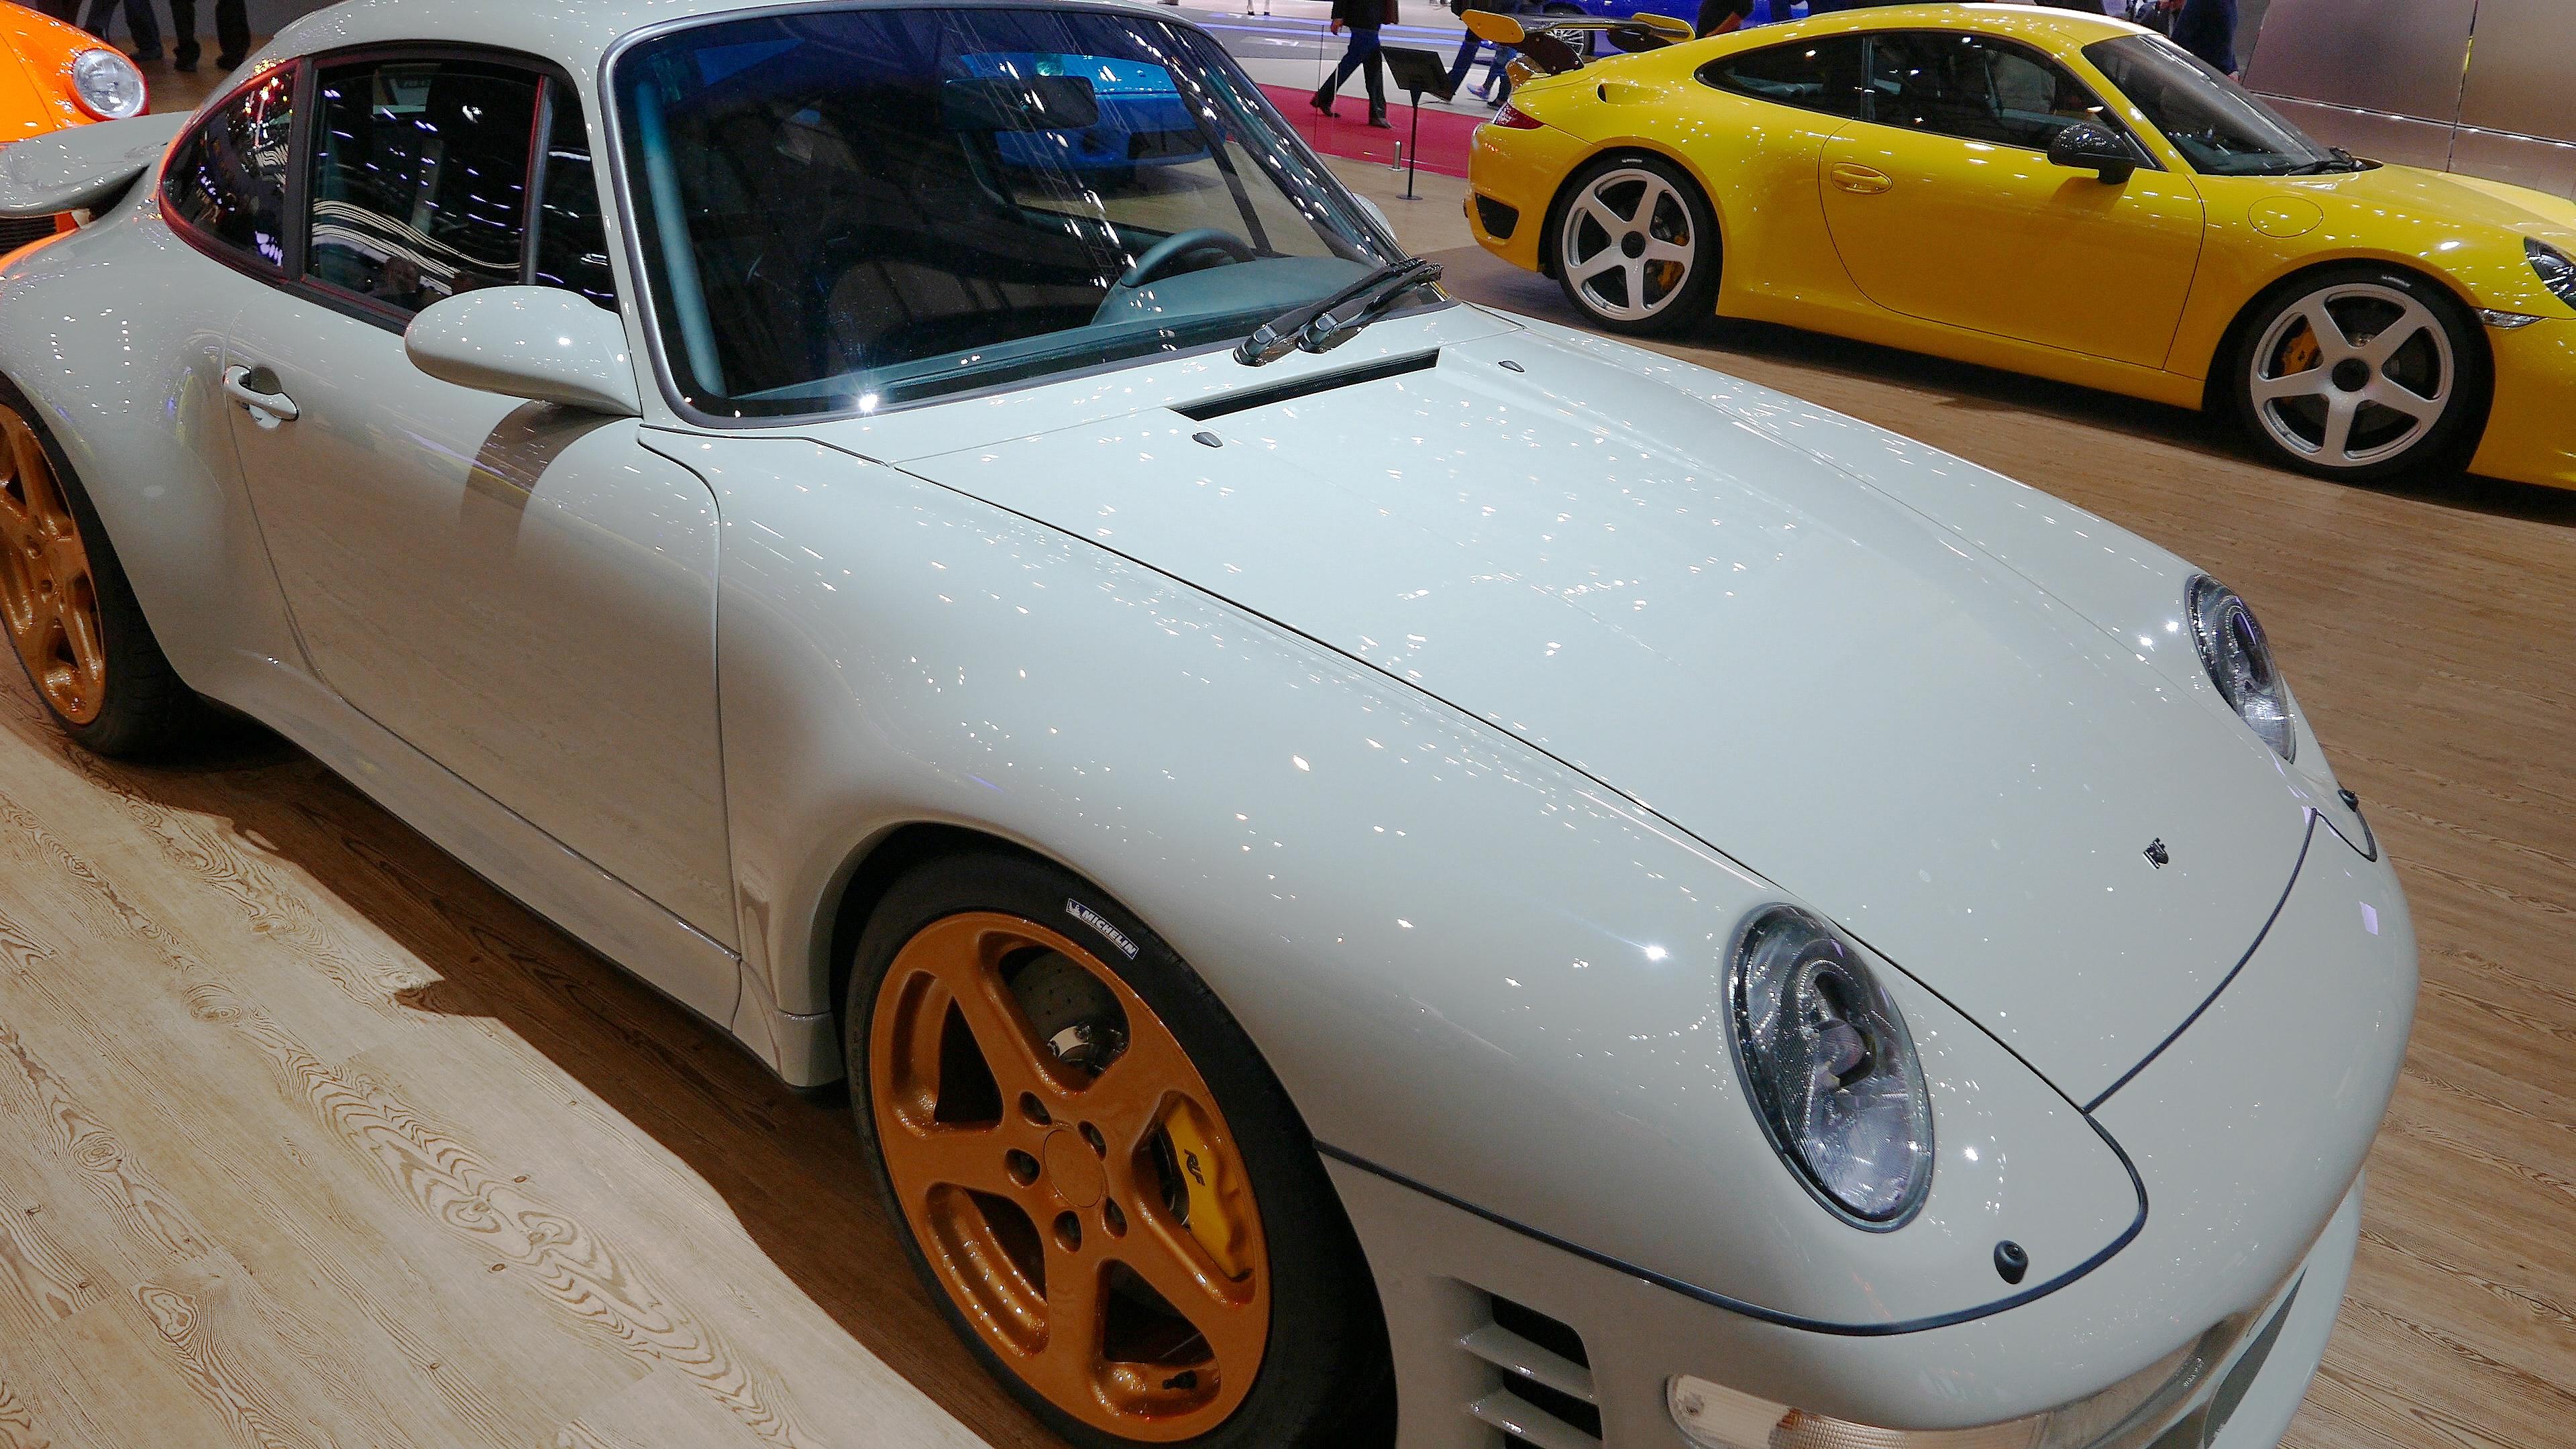 RUF Porsche, Motor, International, Porsche, Salon, HQ Photo